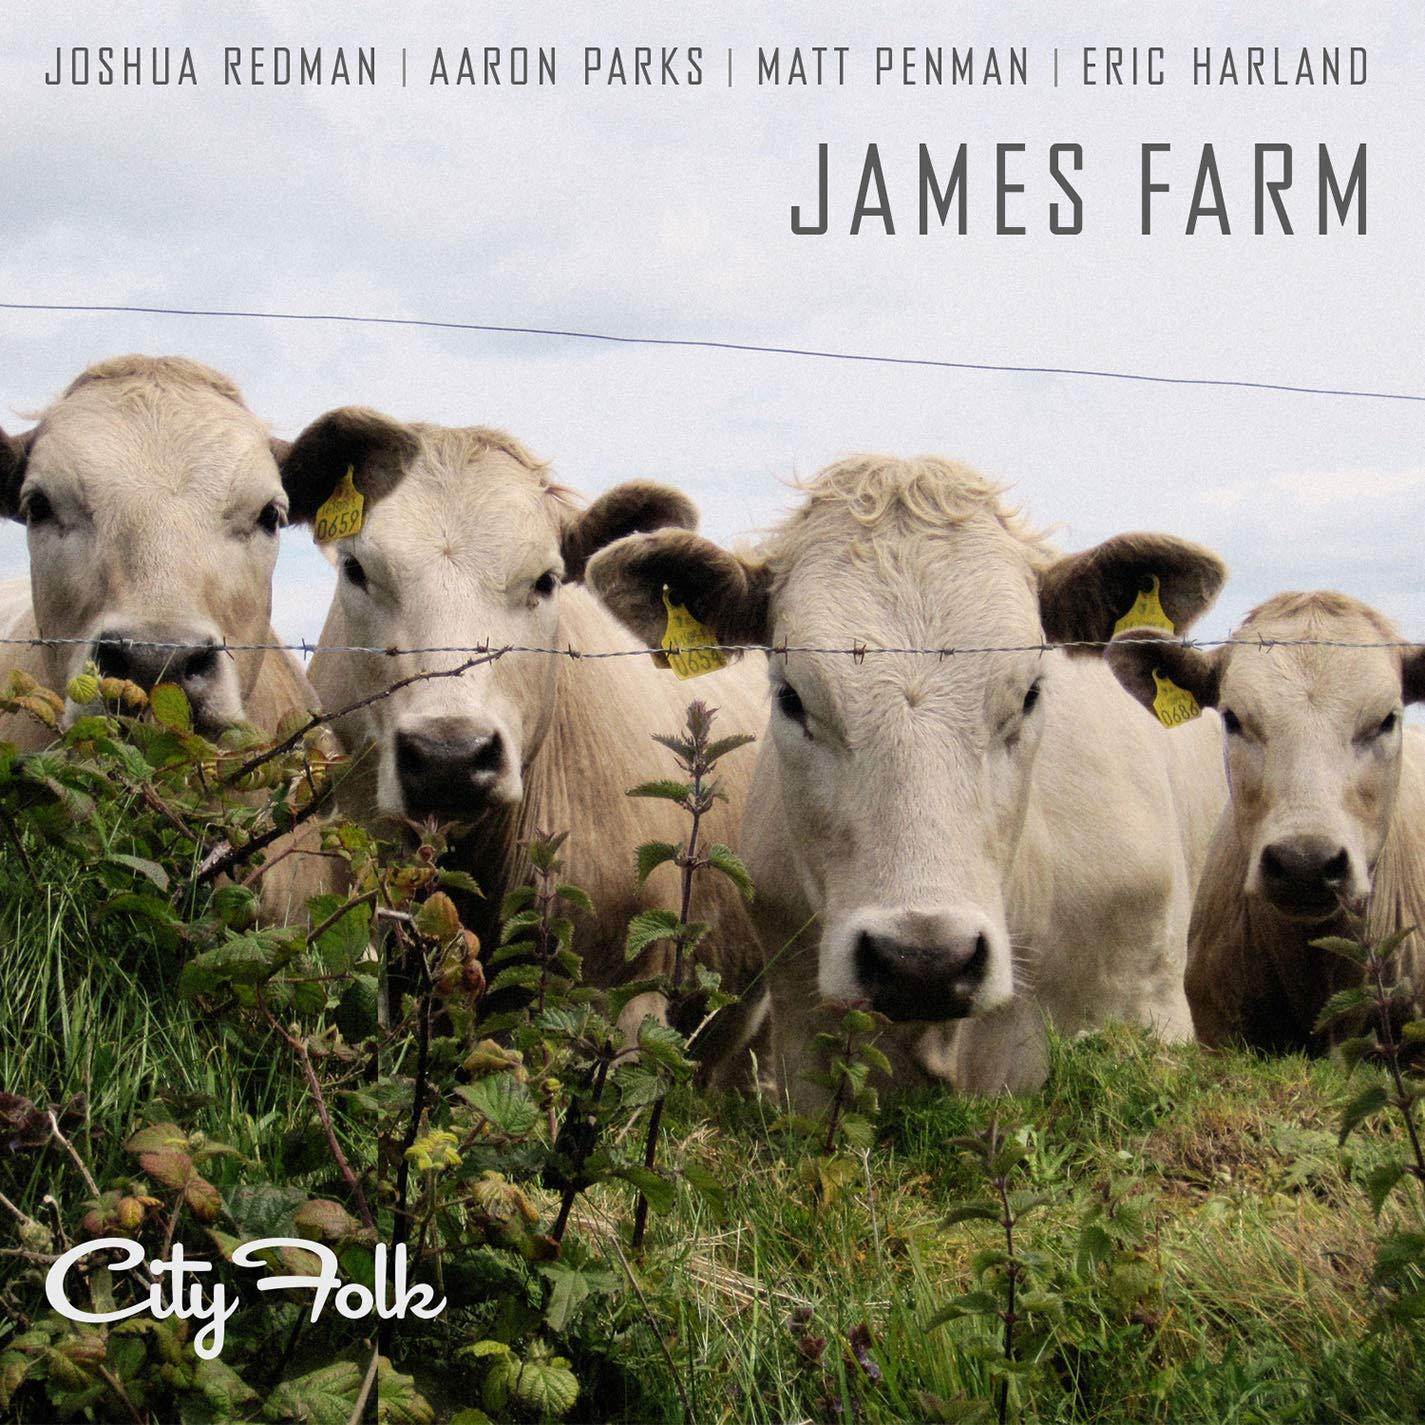 James Farm City Folk Мистерия Звука